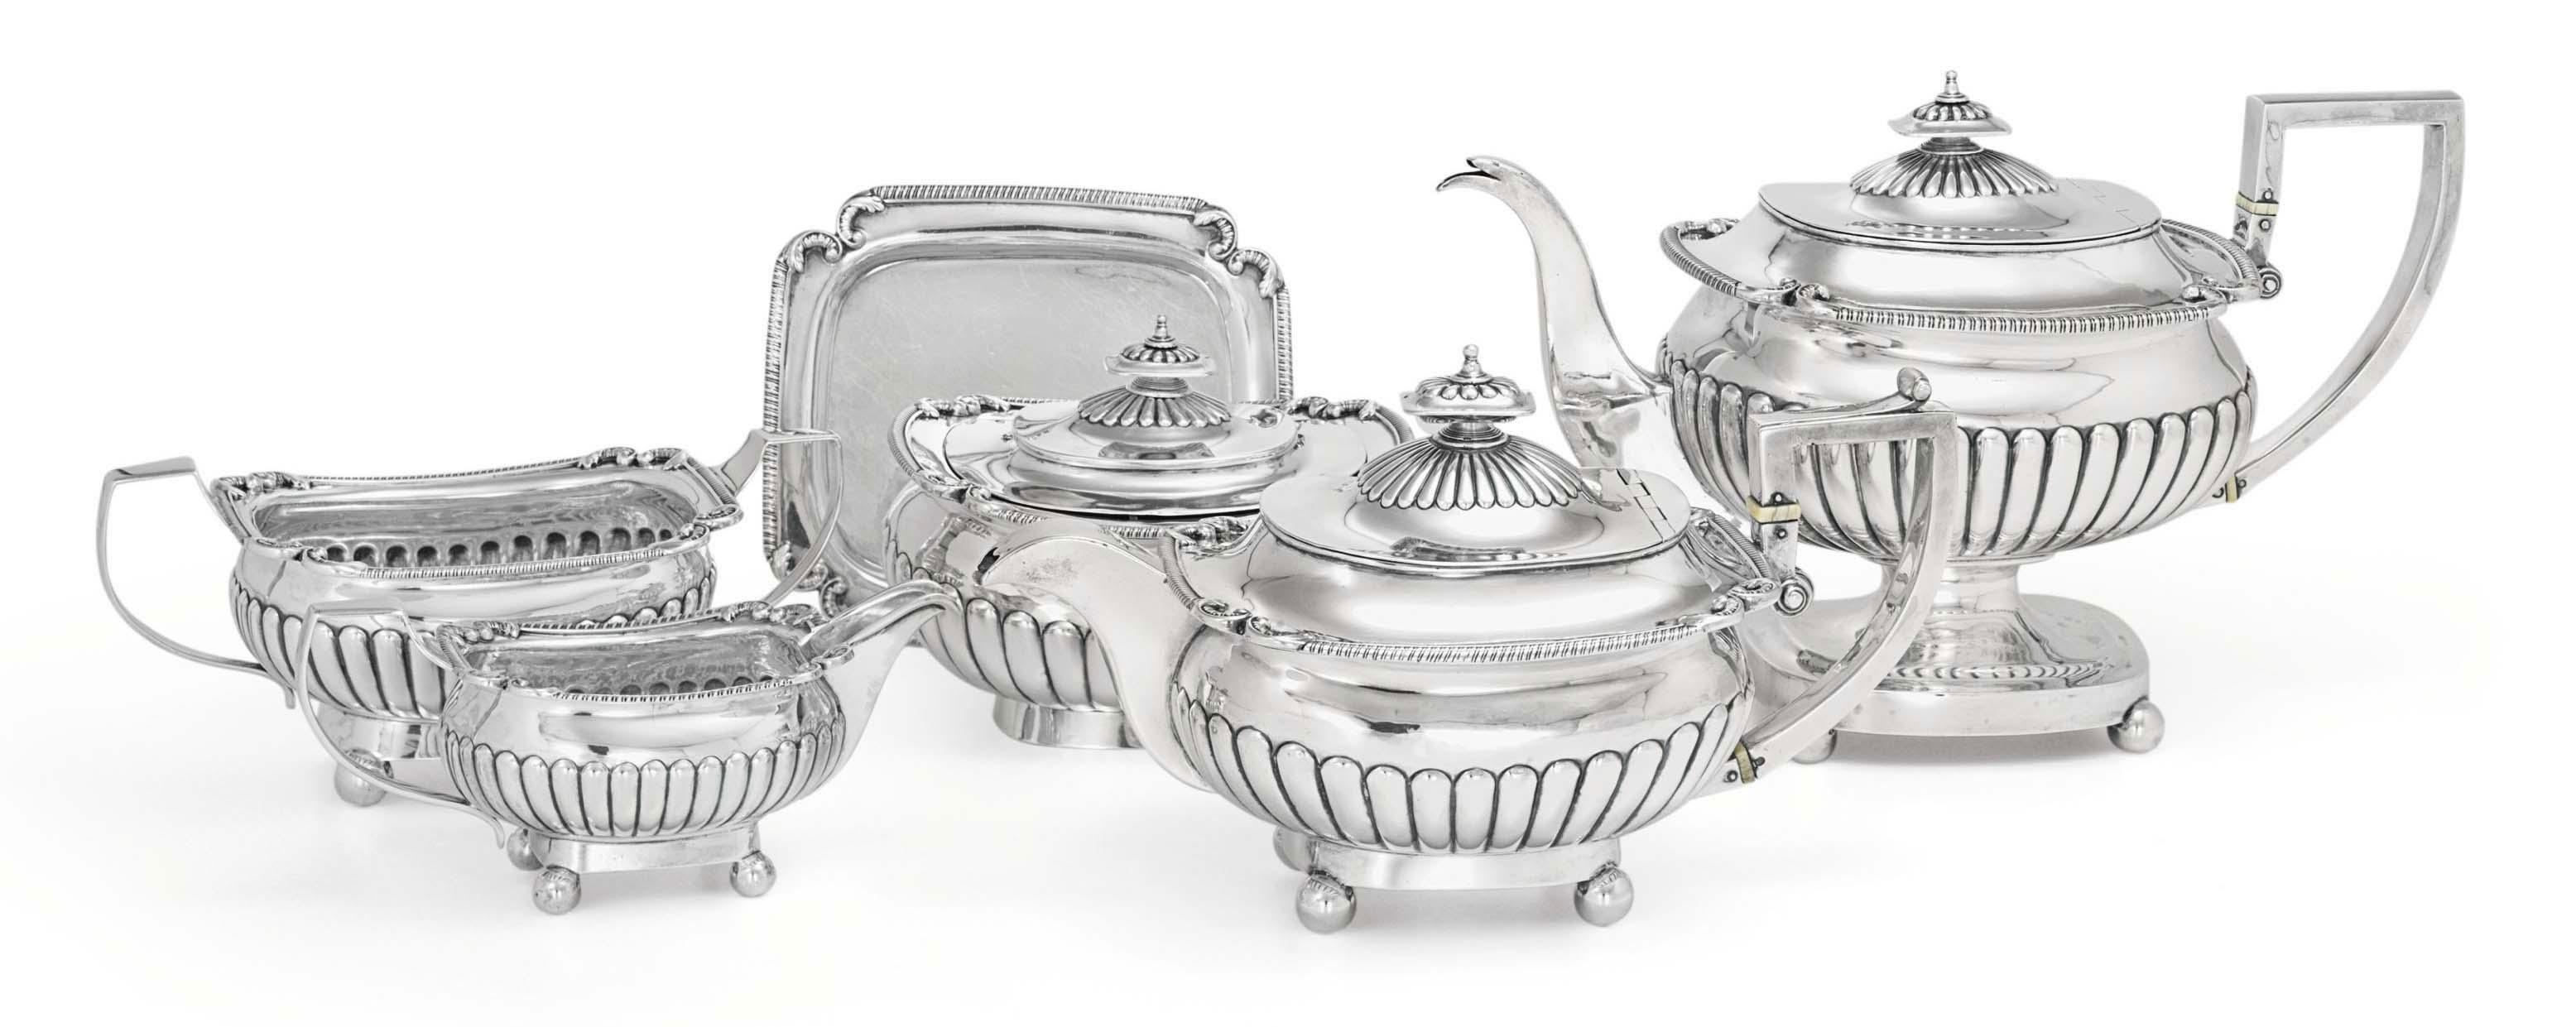 A GEORGE III SILVER FIVE-PIECE TEA AND COFFEE SERVICE**